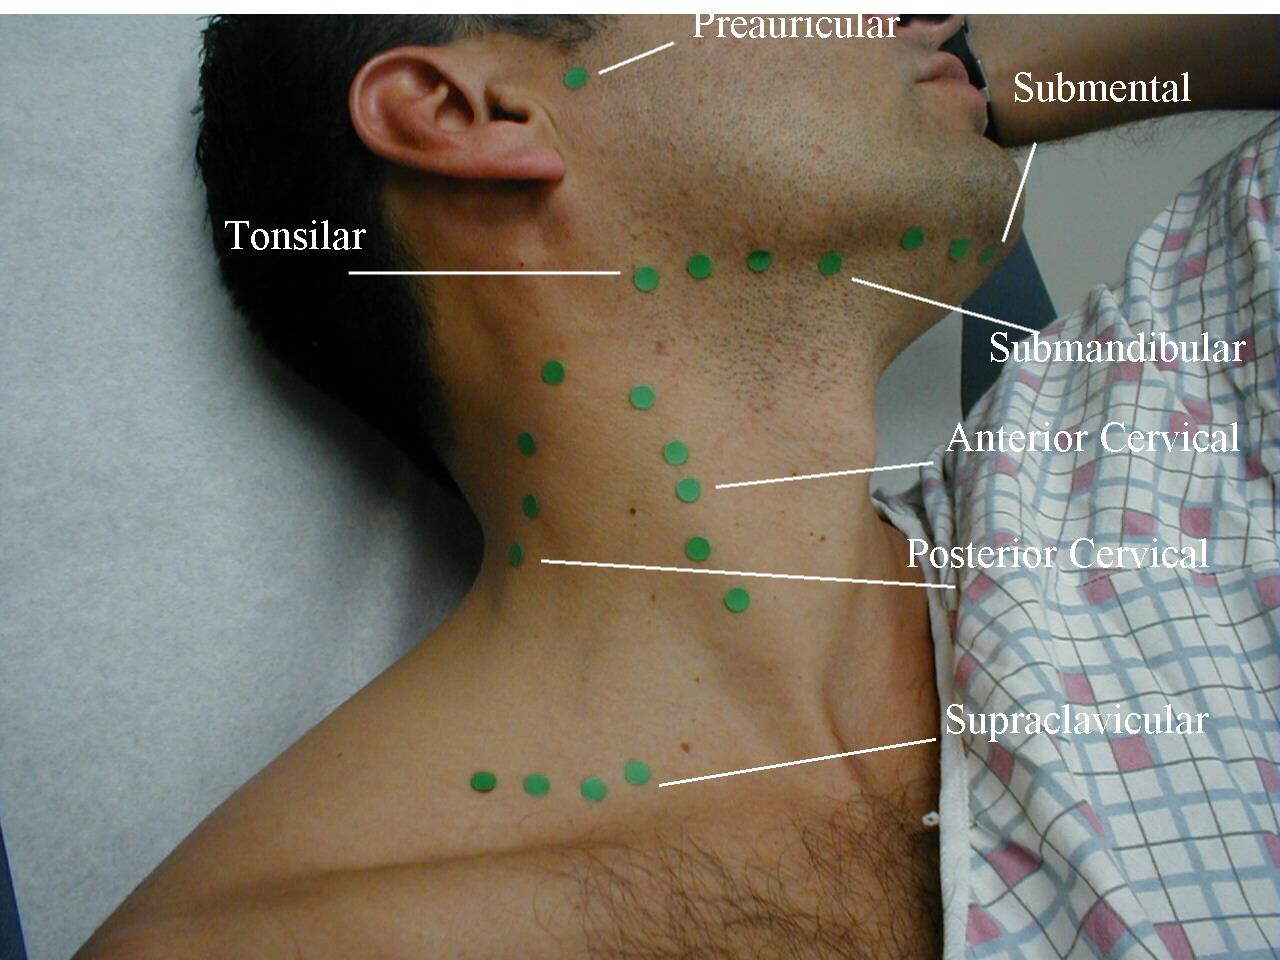 diagram glands under chin pemeriksaan kelenjar getah bening diagram of sweat glands valves #9